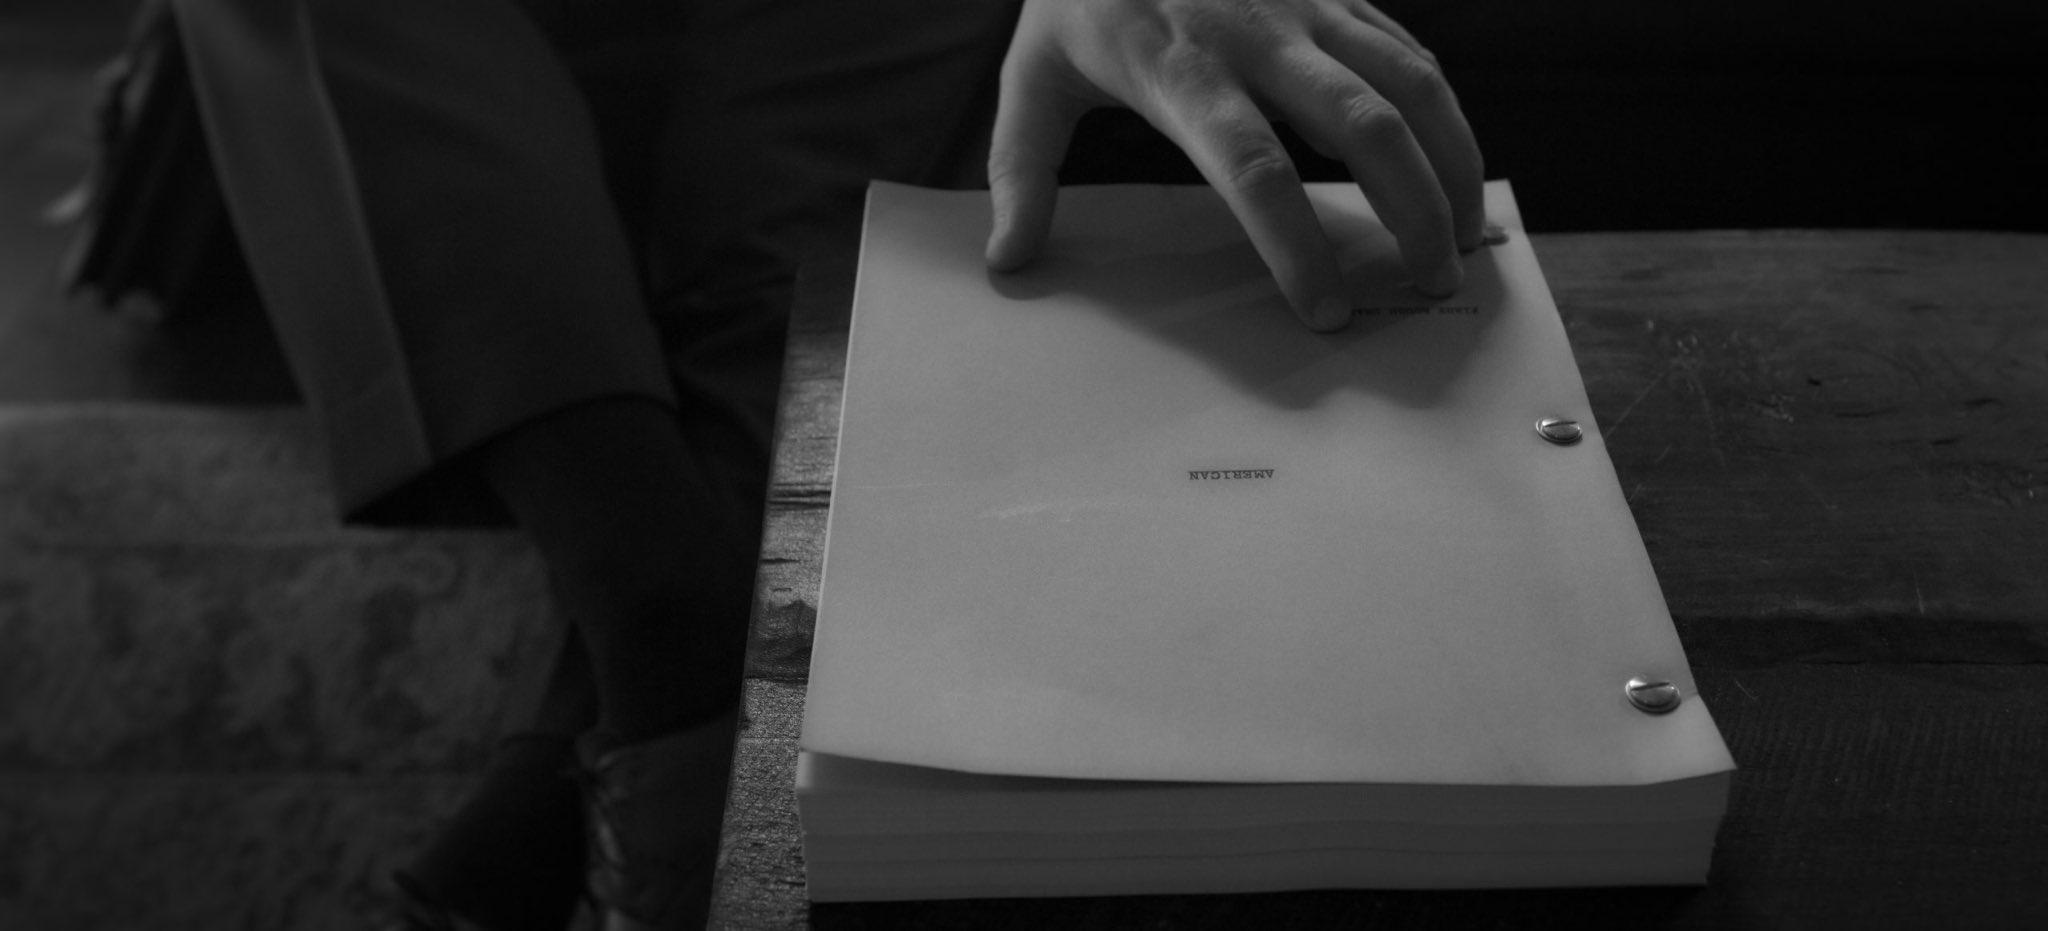 David Fincher Mank Netflix Bild 2